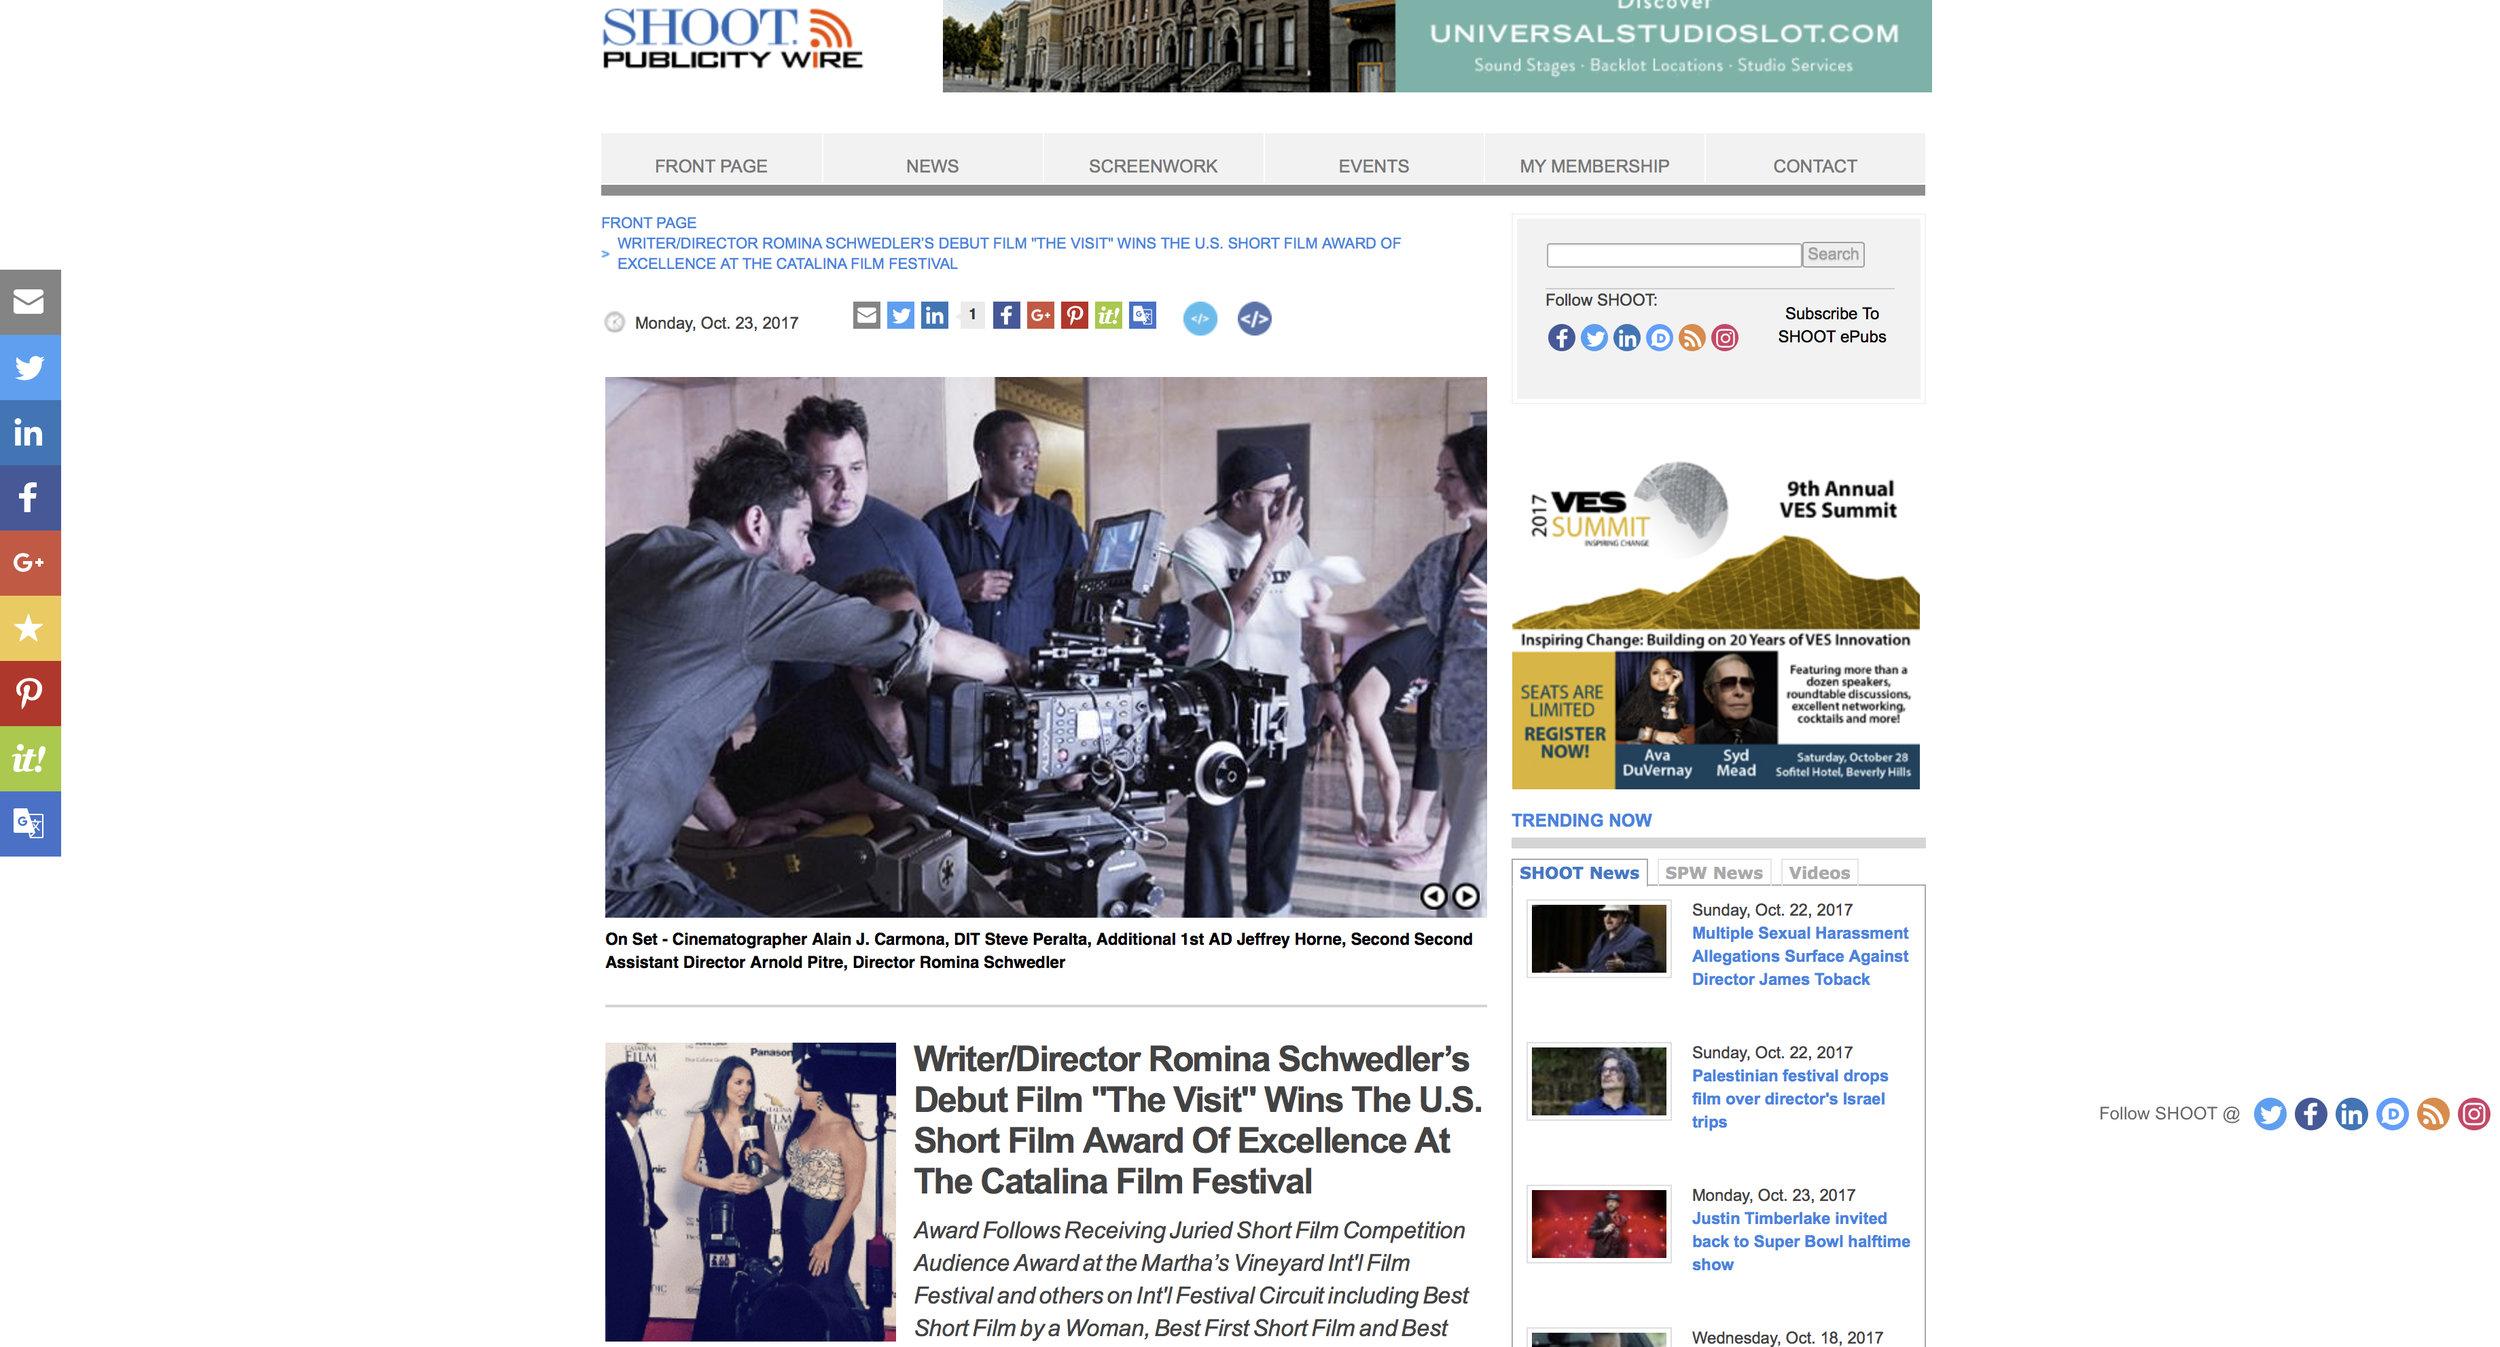 SHOOT_Magazine_CatalinaAward.jpg